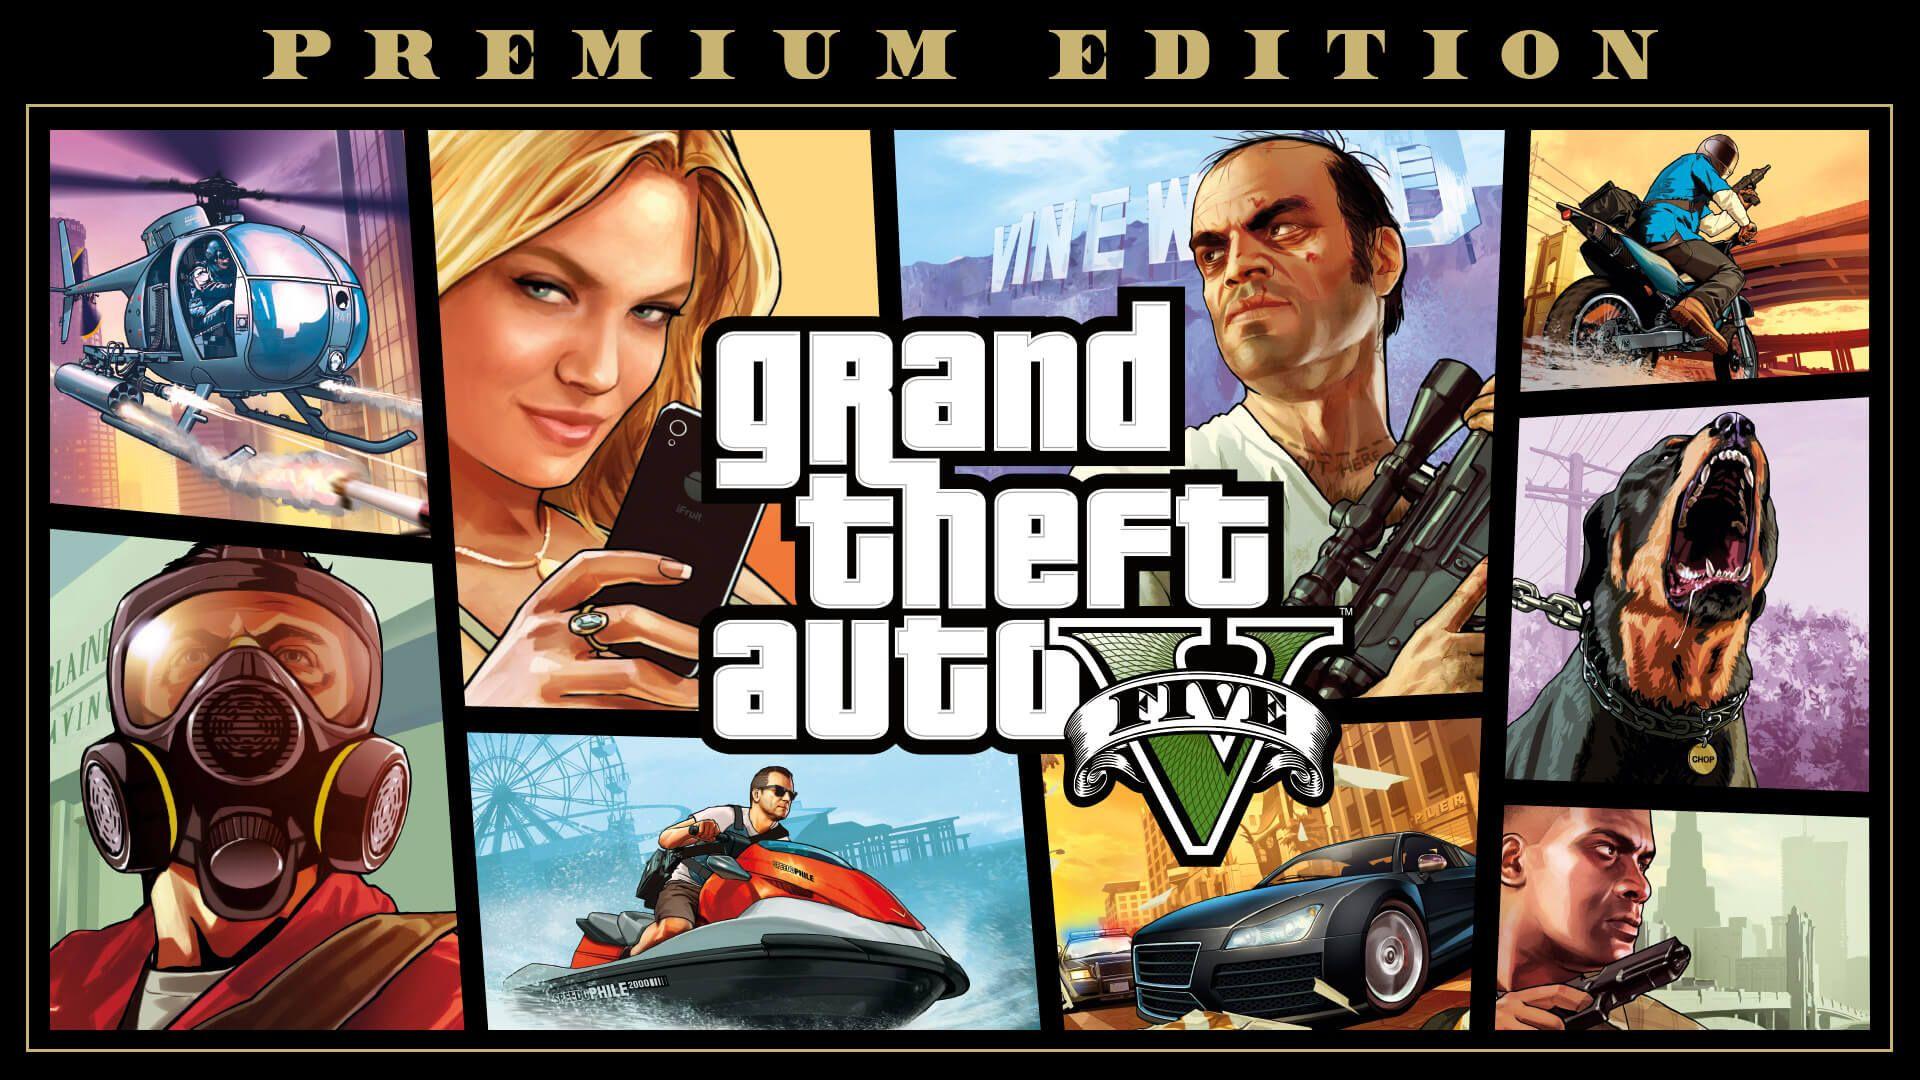 GTA V cover poster